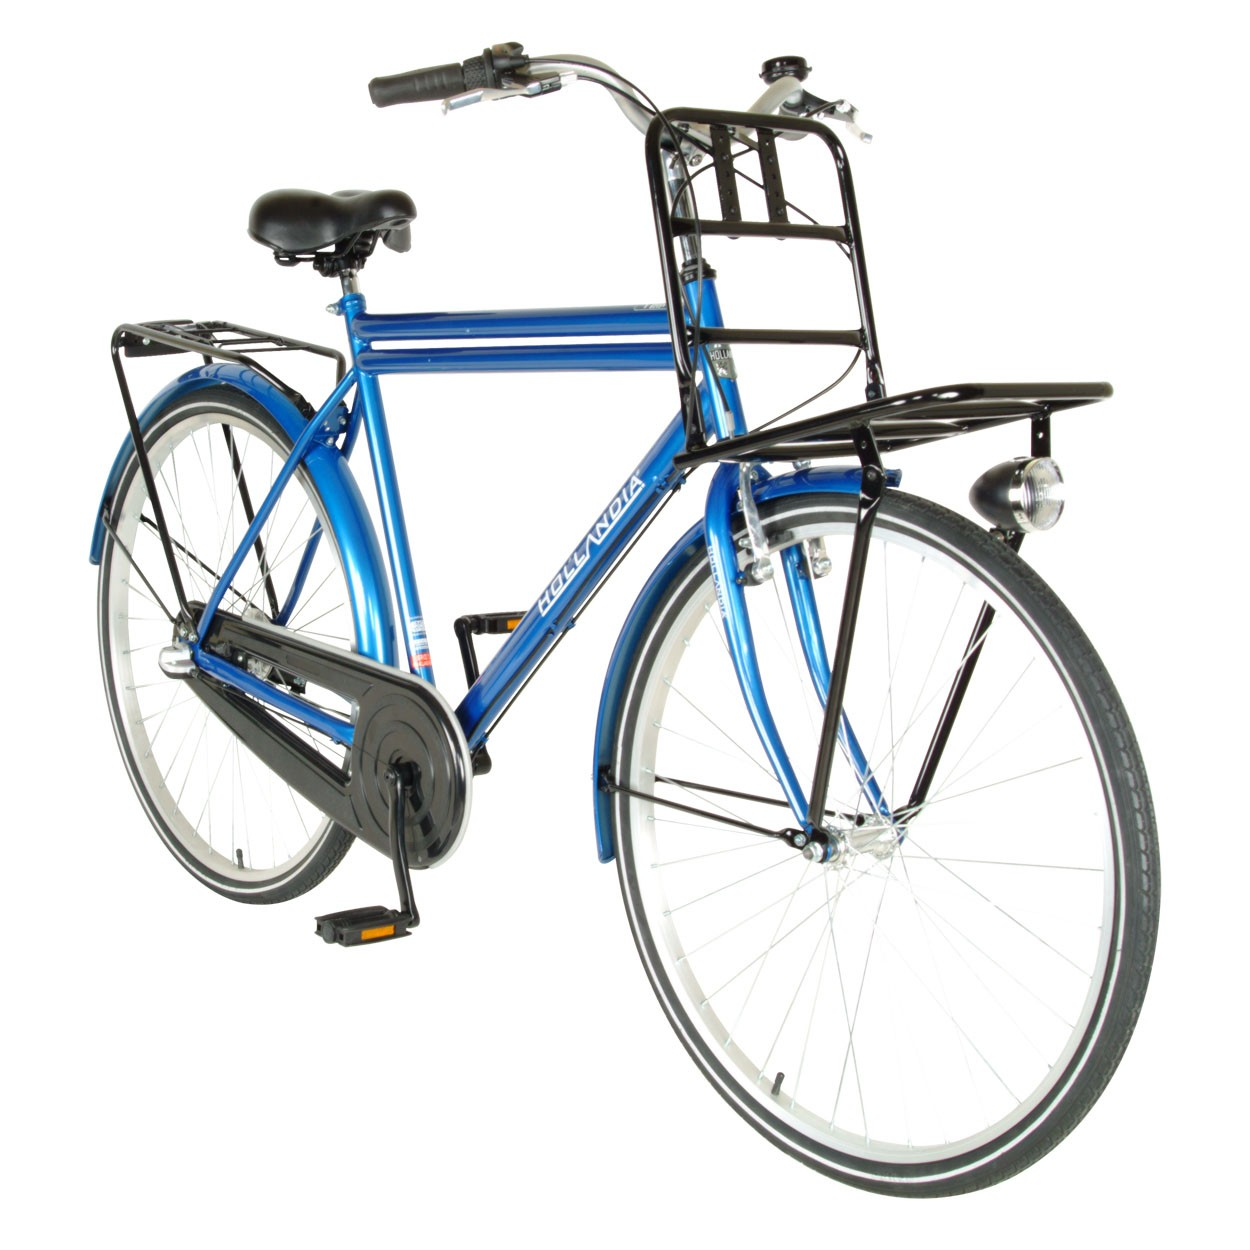 Hollandia Amsterdam 28 inch Bike (Mutliple Colors)